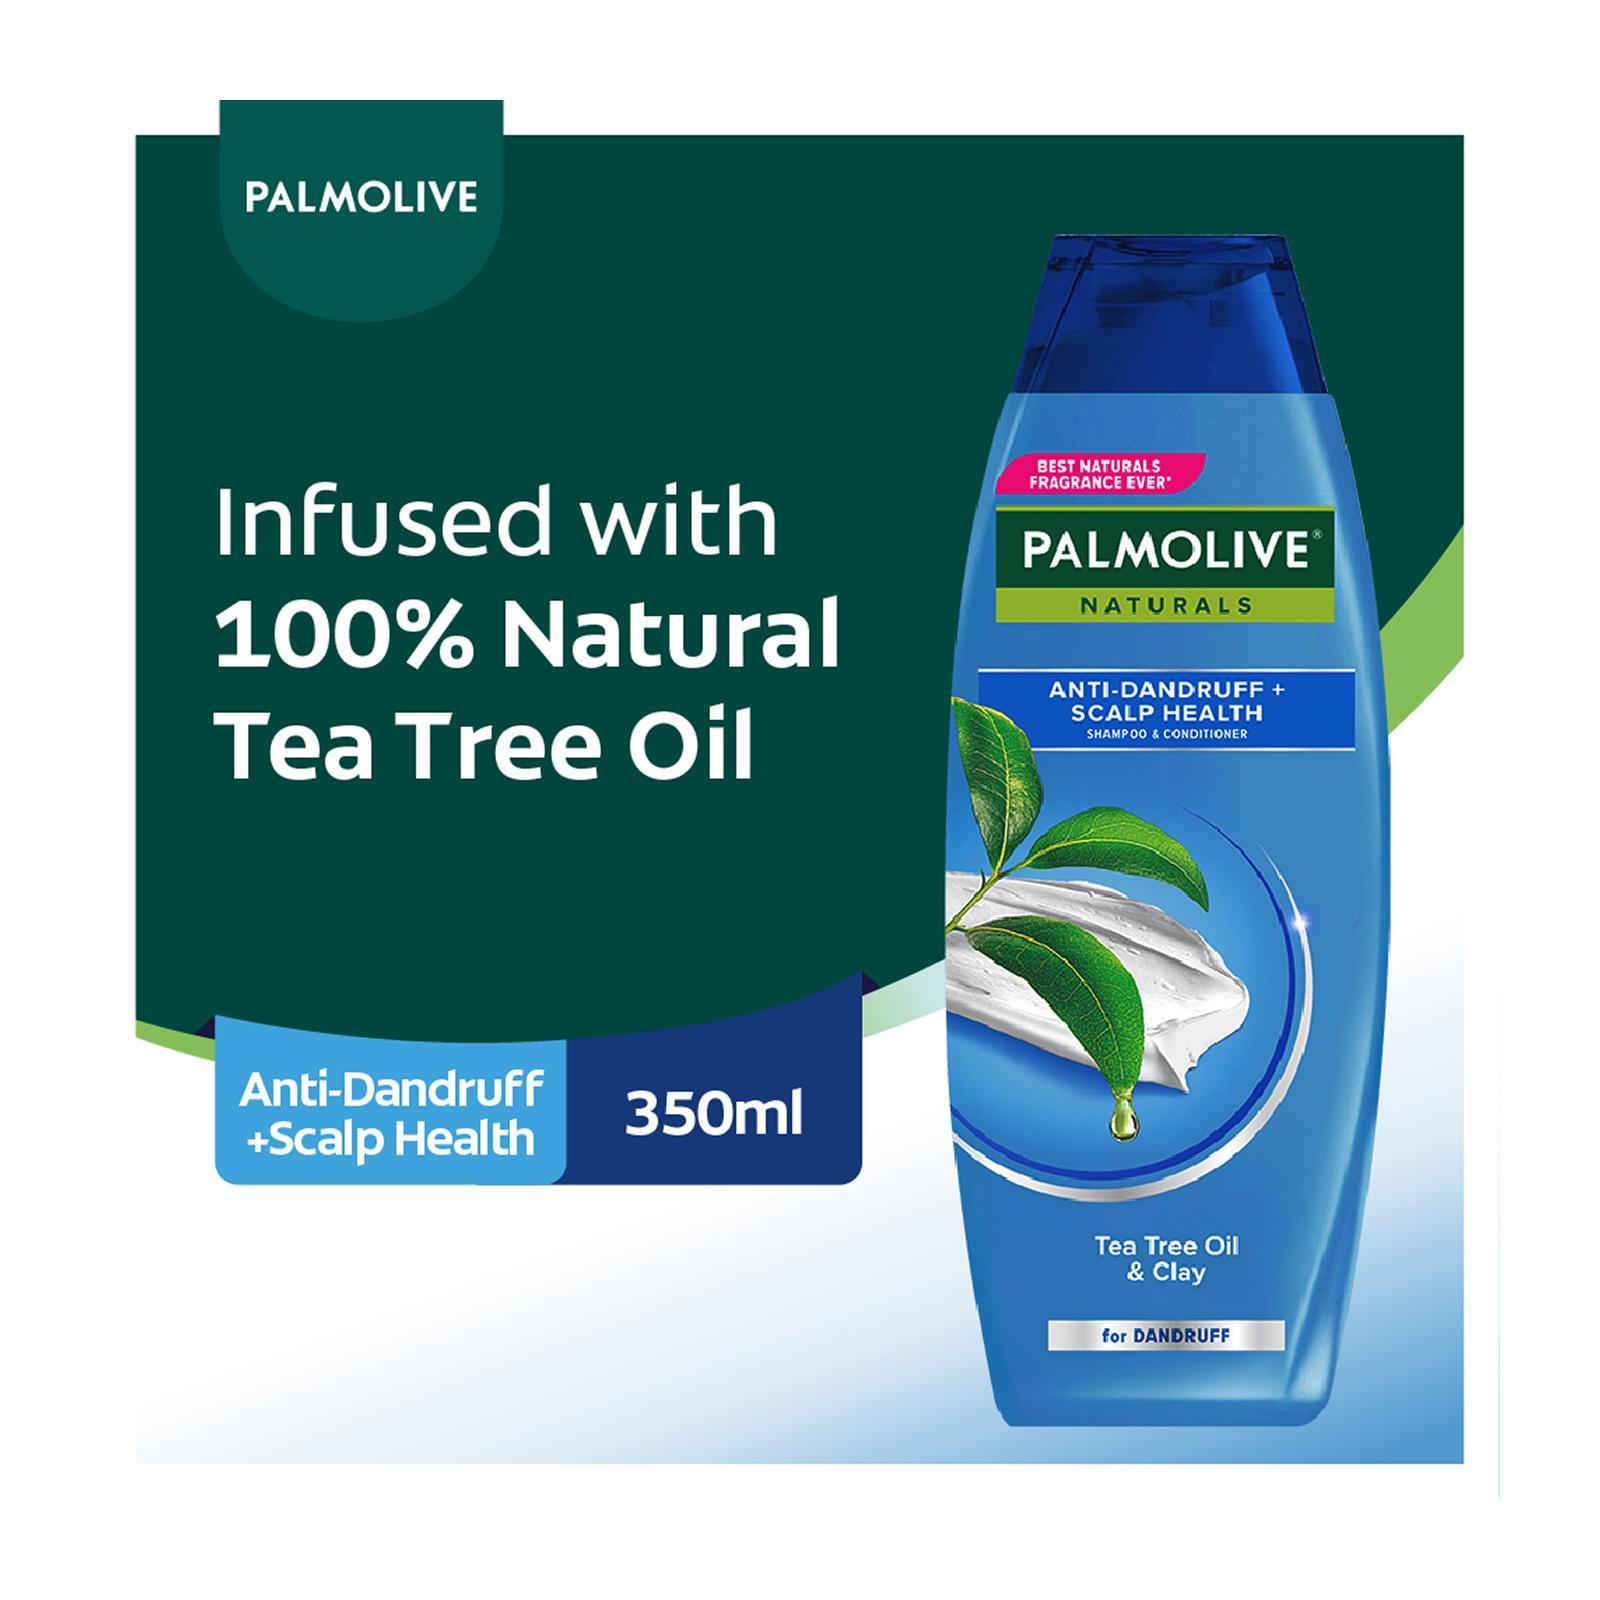 Palmolive Naturals Anti Dandruff + Scalp Health Shampoo and Conditioner 350ml